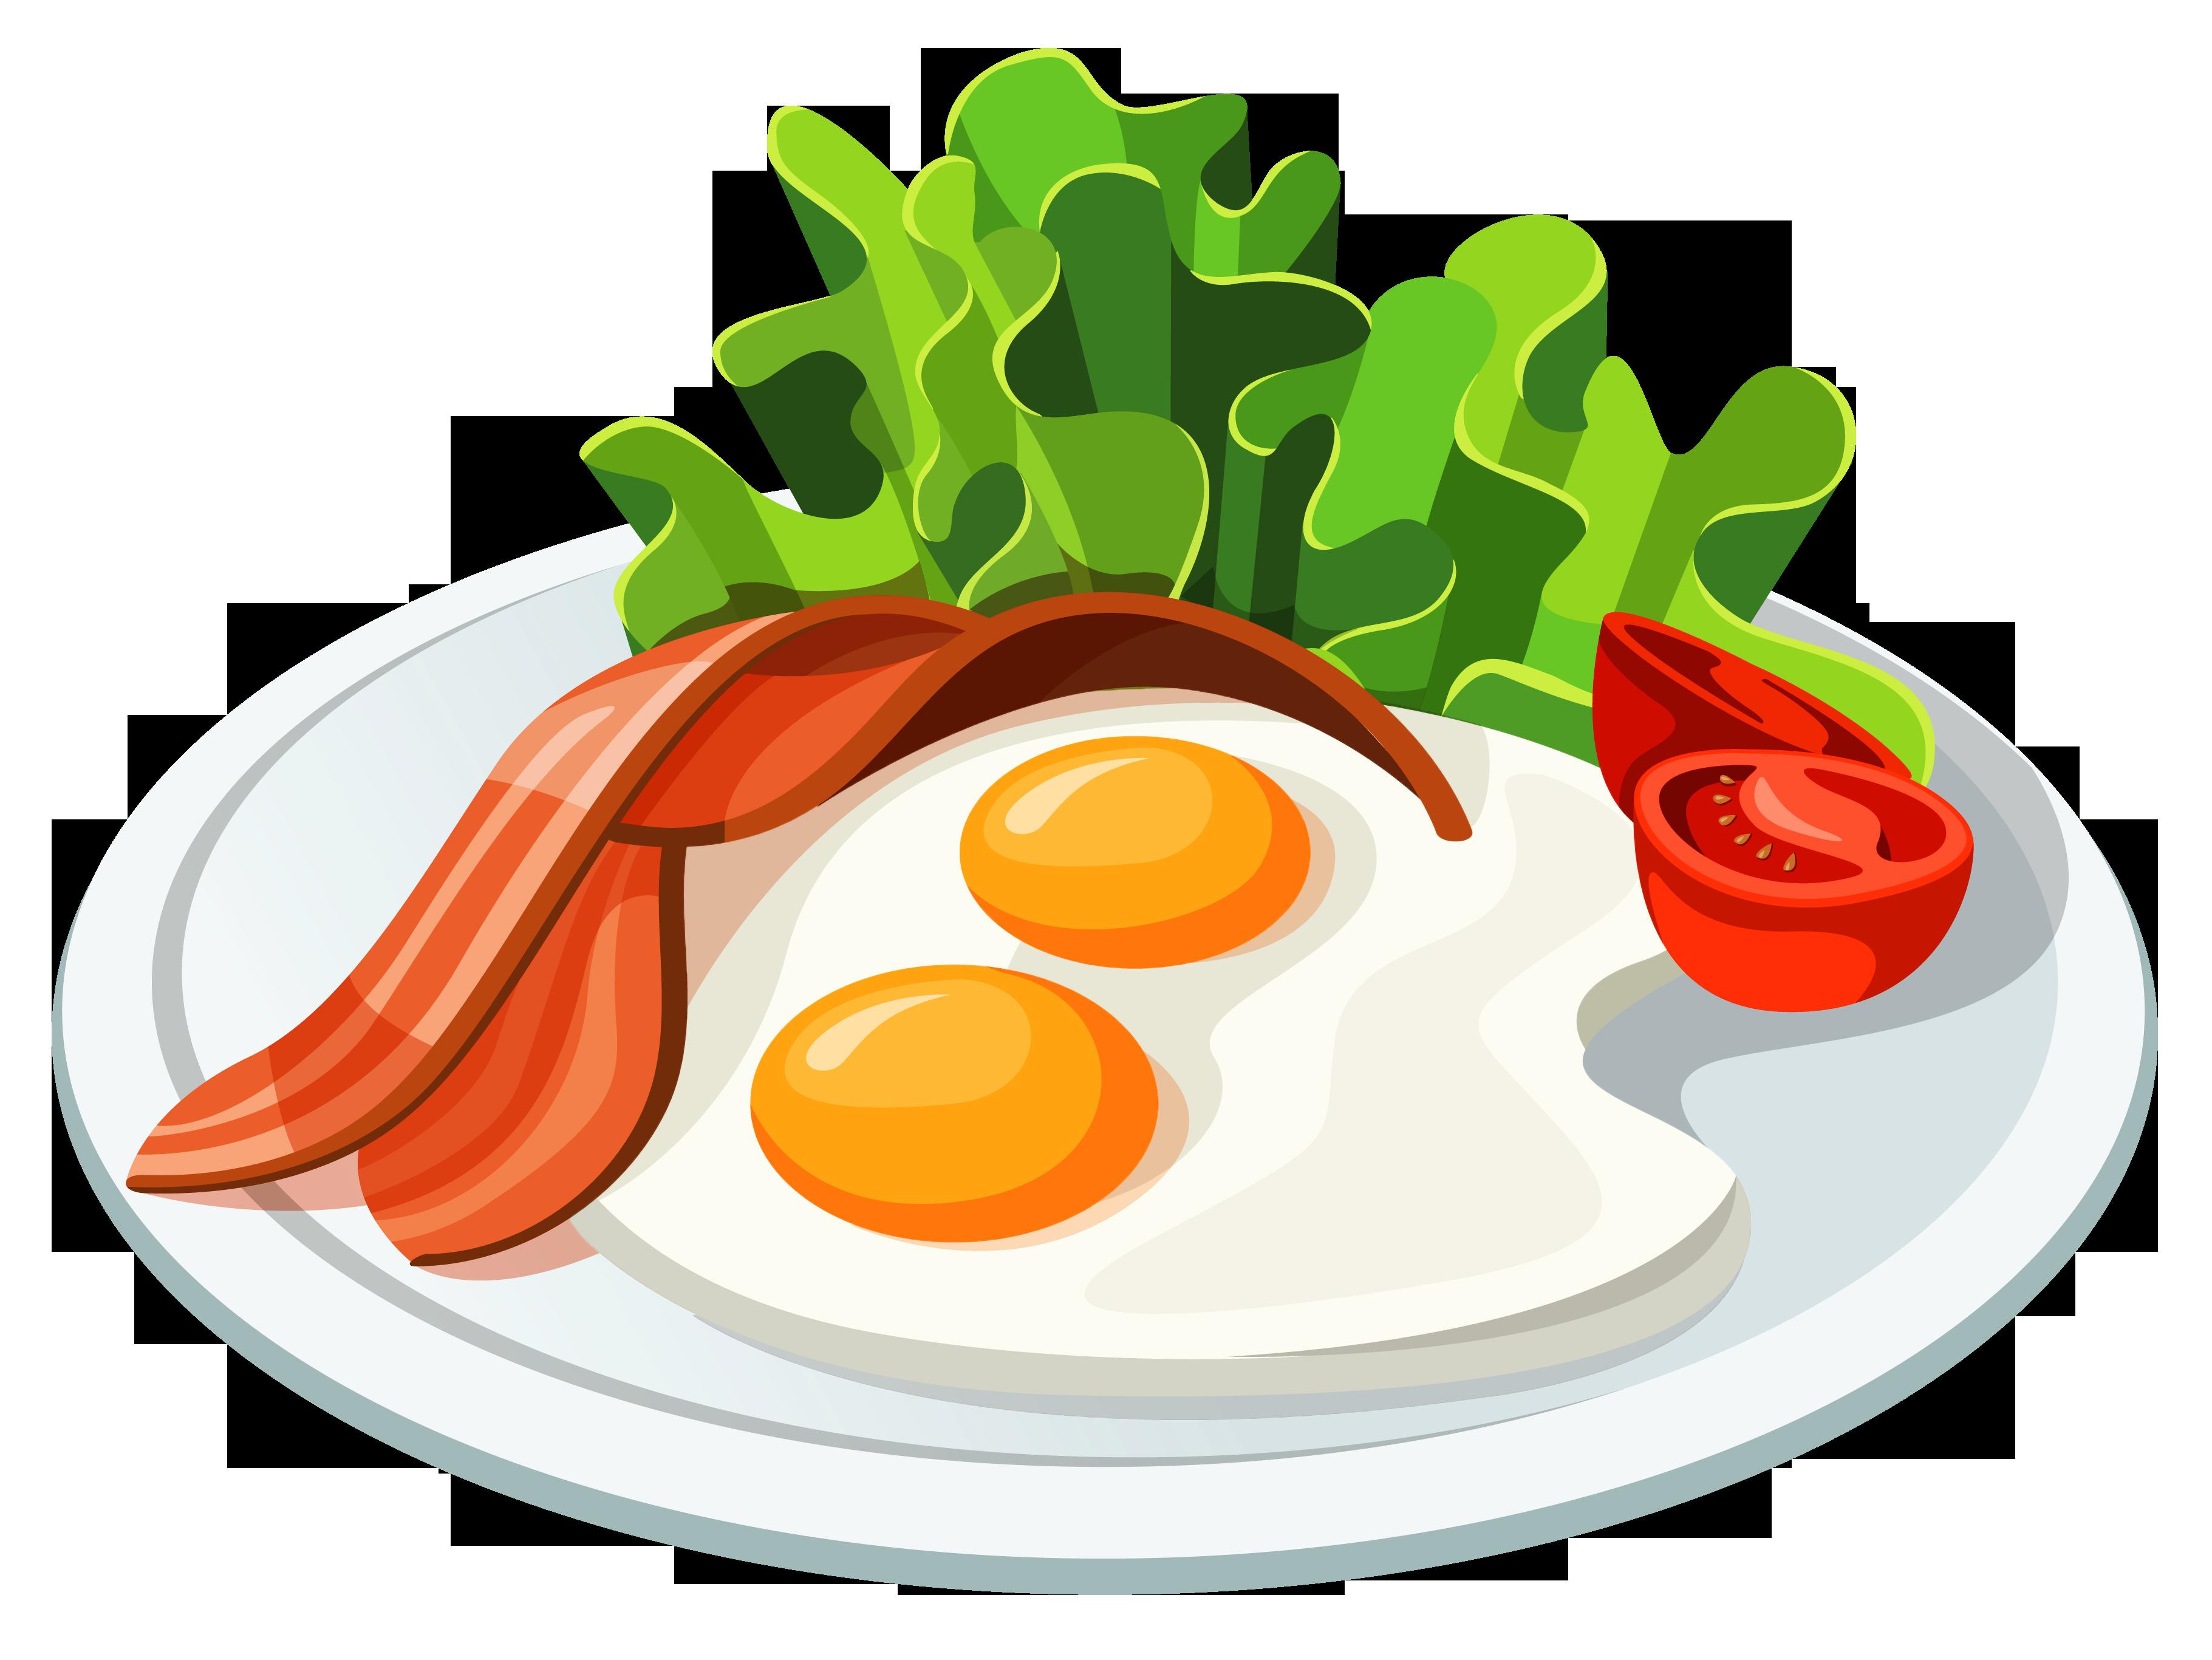 Eggs and Bacon PNG Vector Clipart | Рисунки Нарисованные От Руки ...